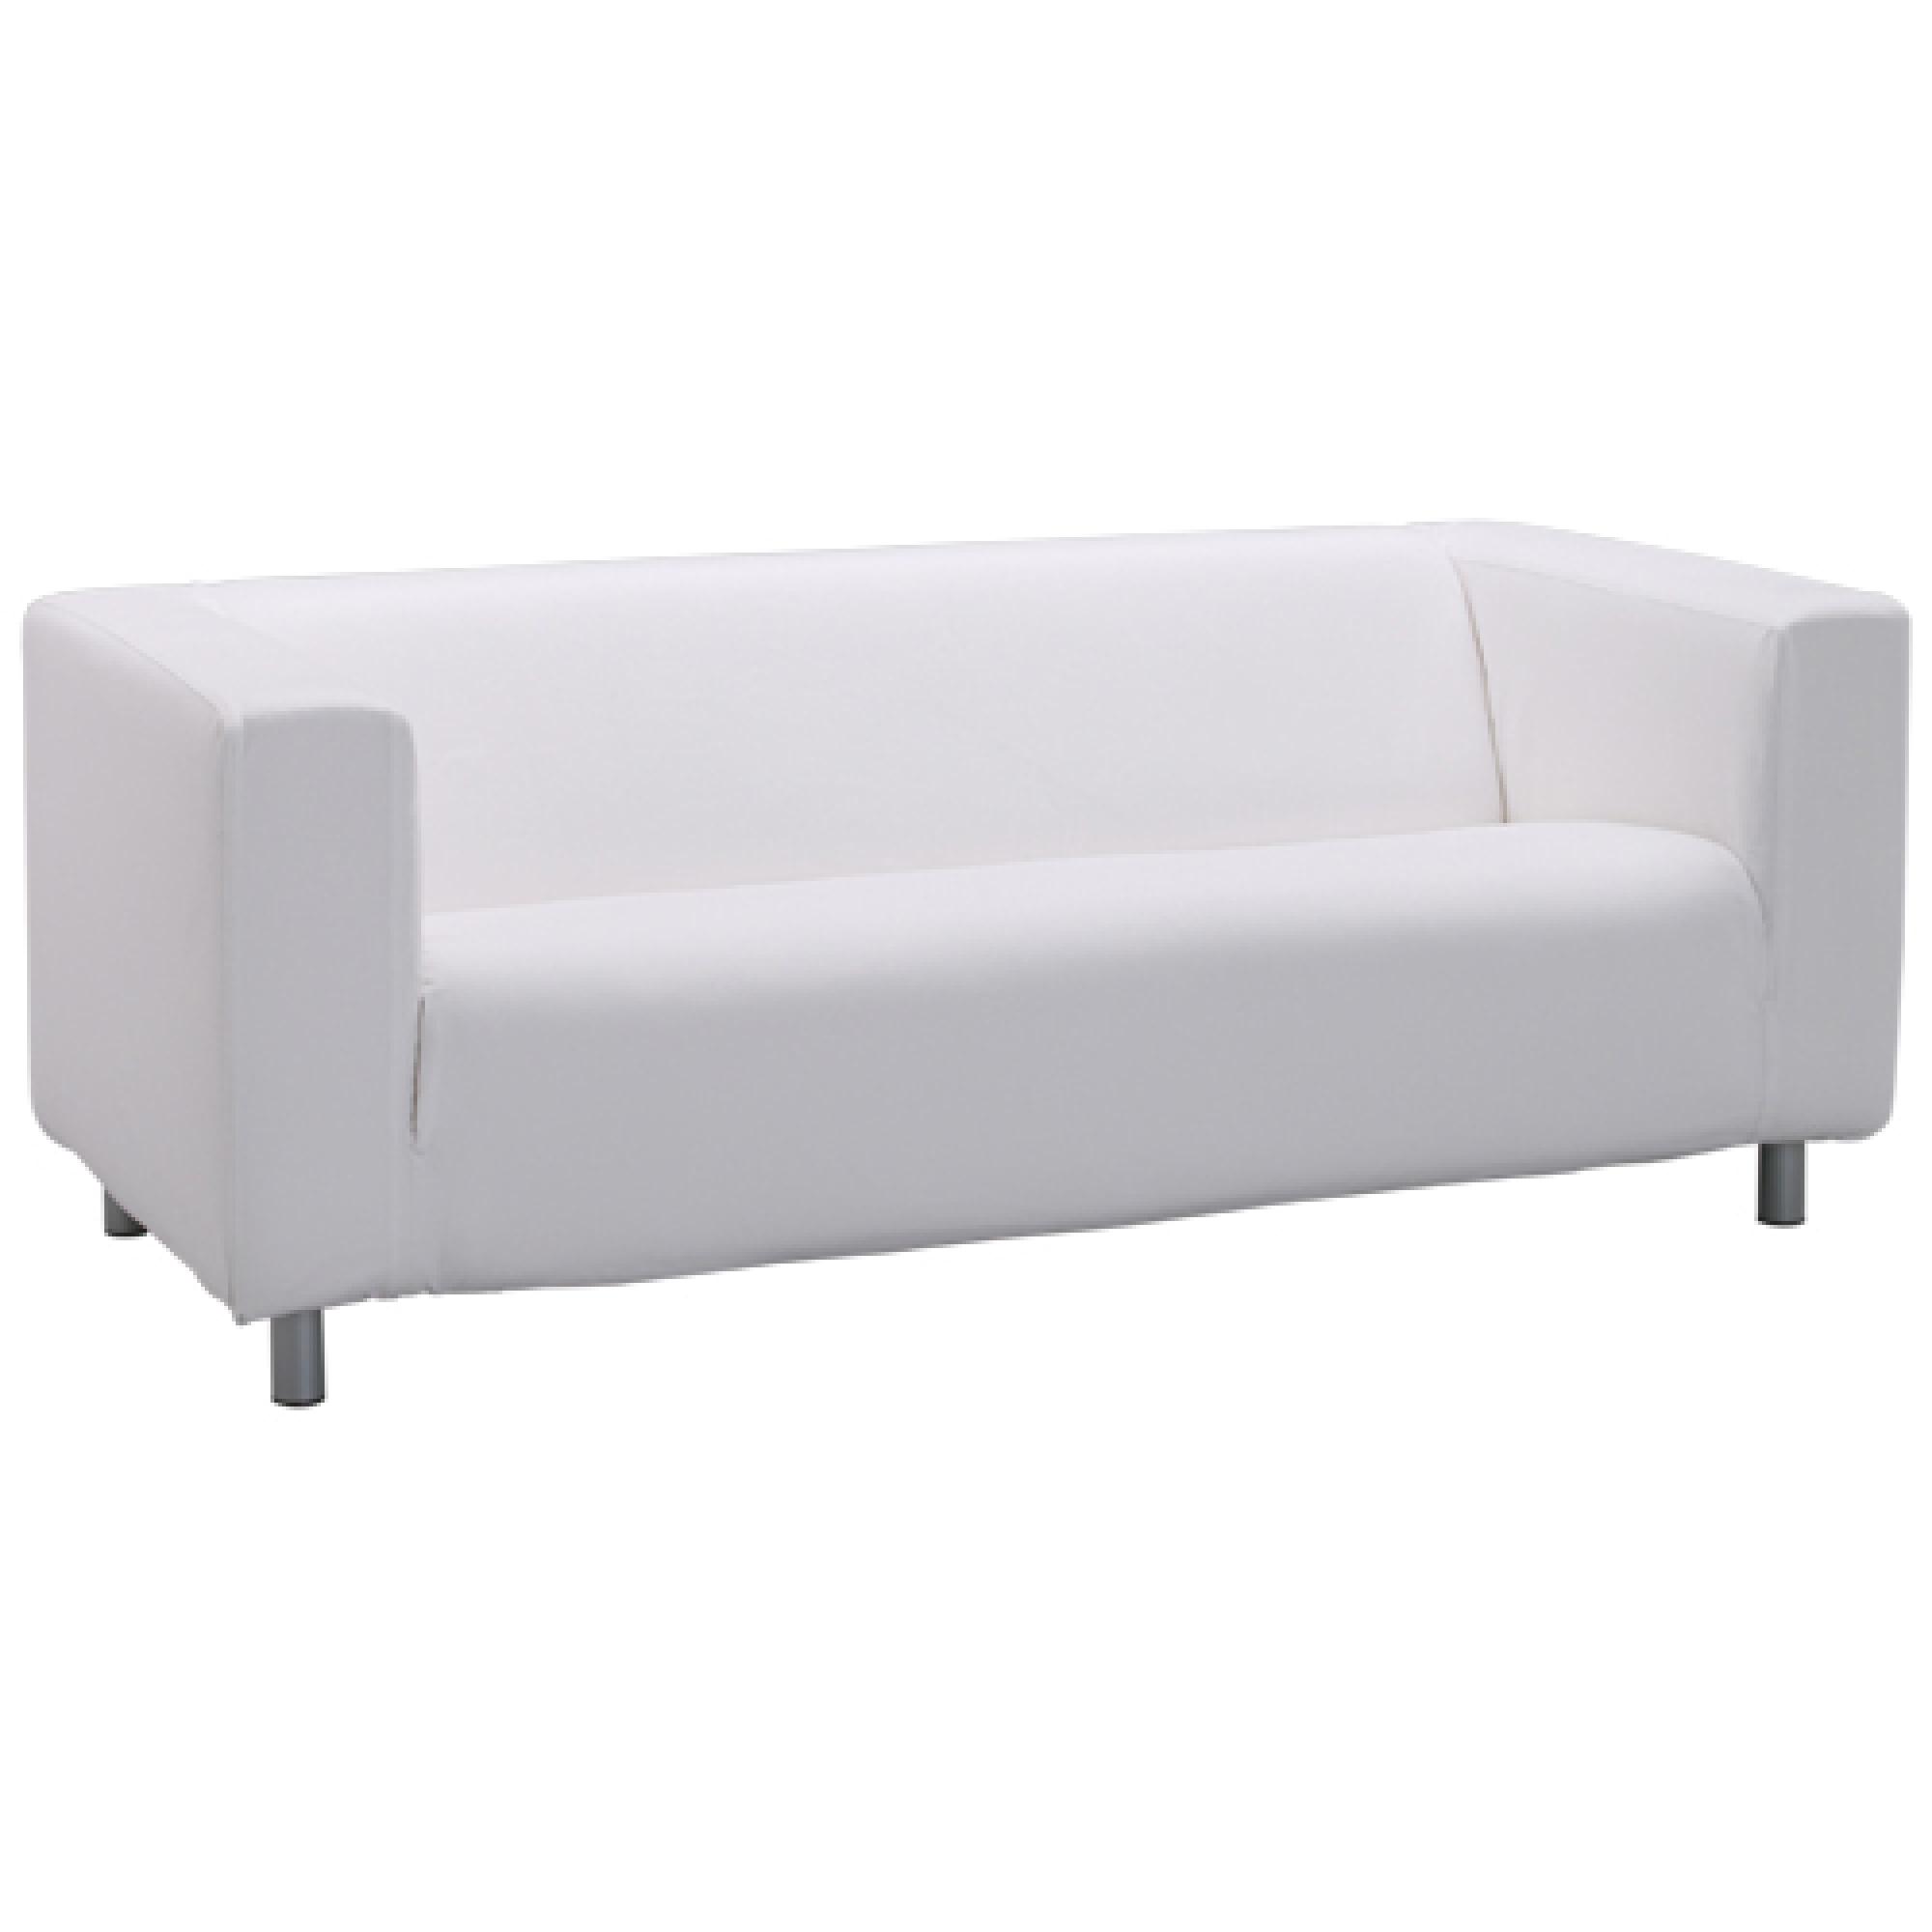 ikea sofa cama plazas